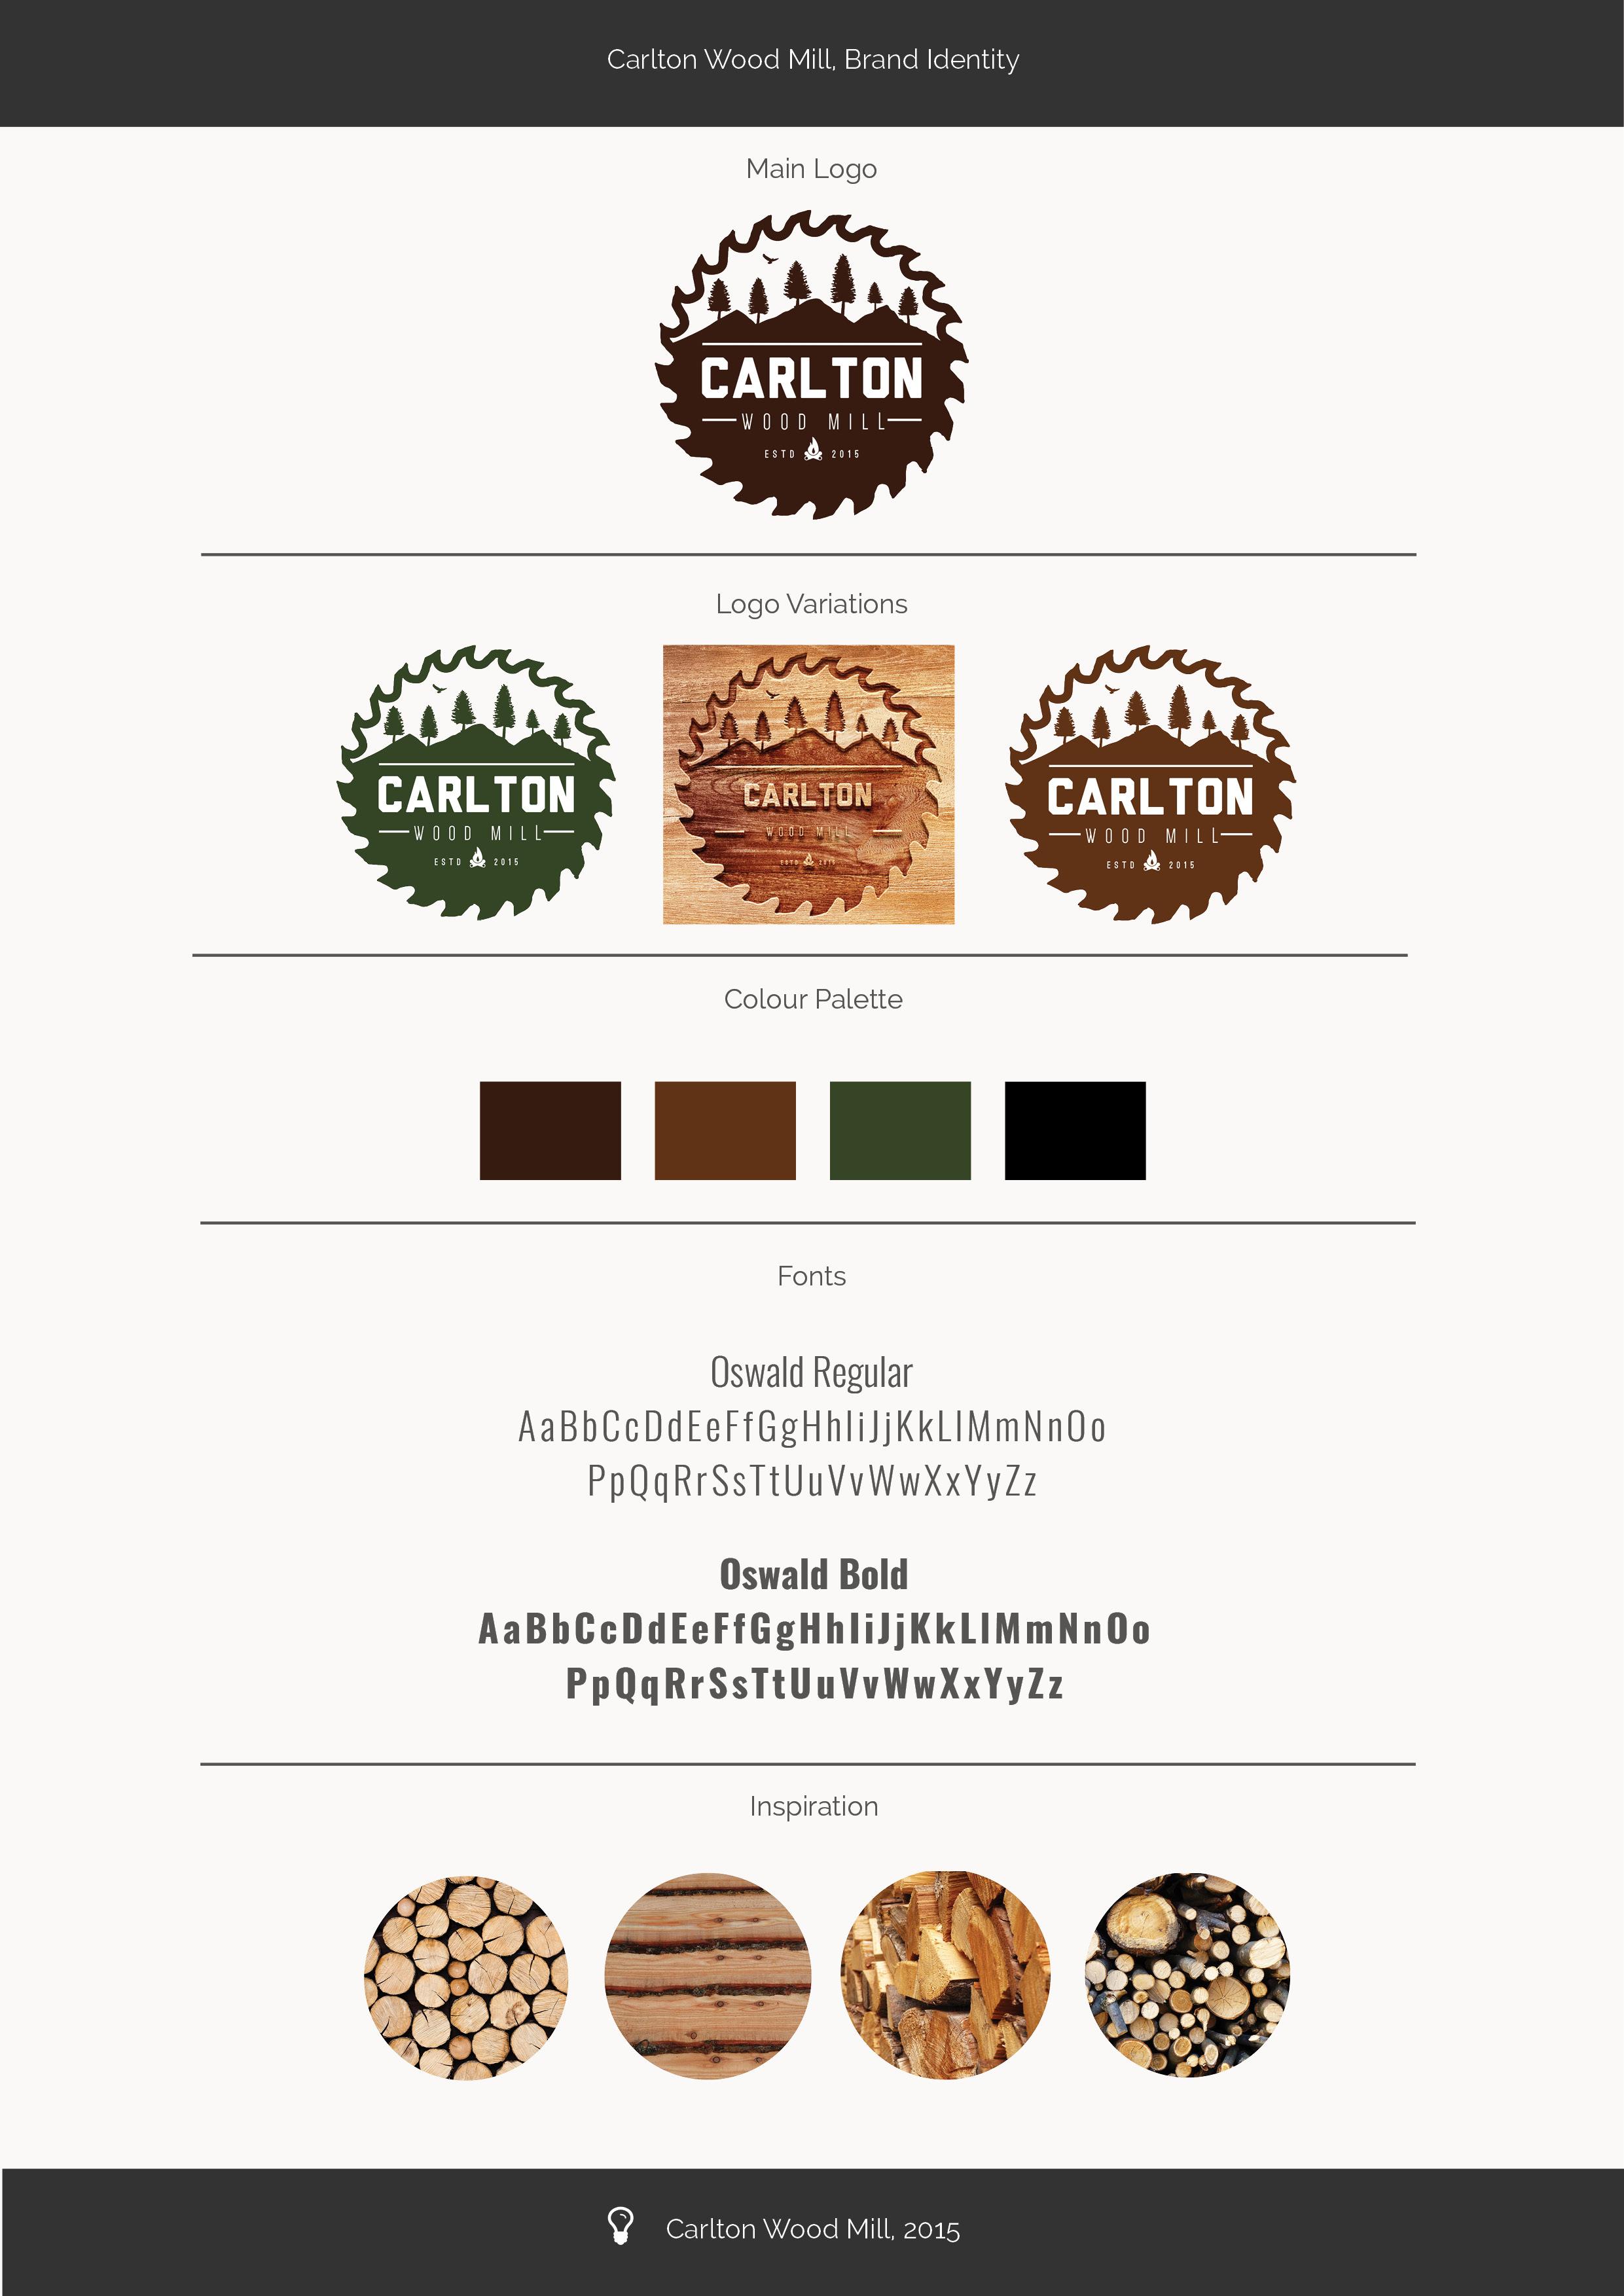 Carlton Woodmill Brand Identity